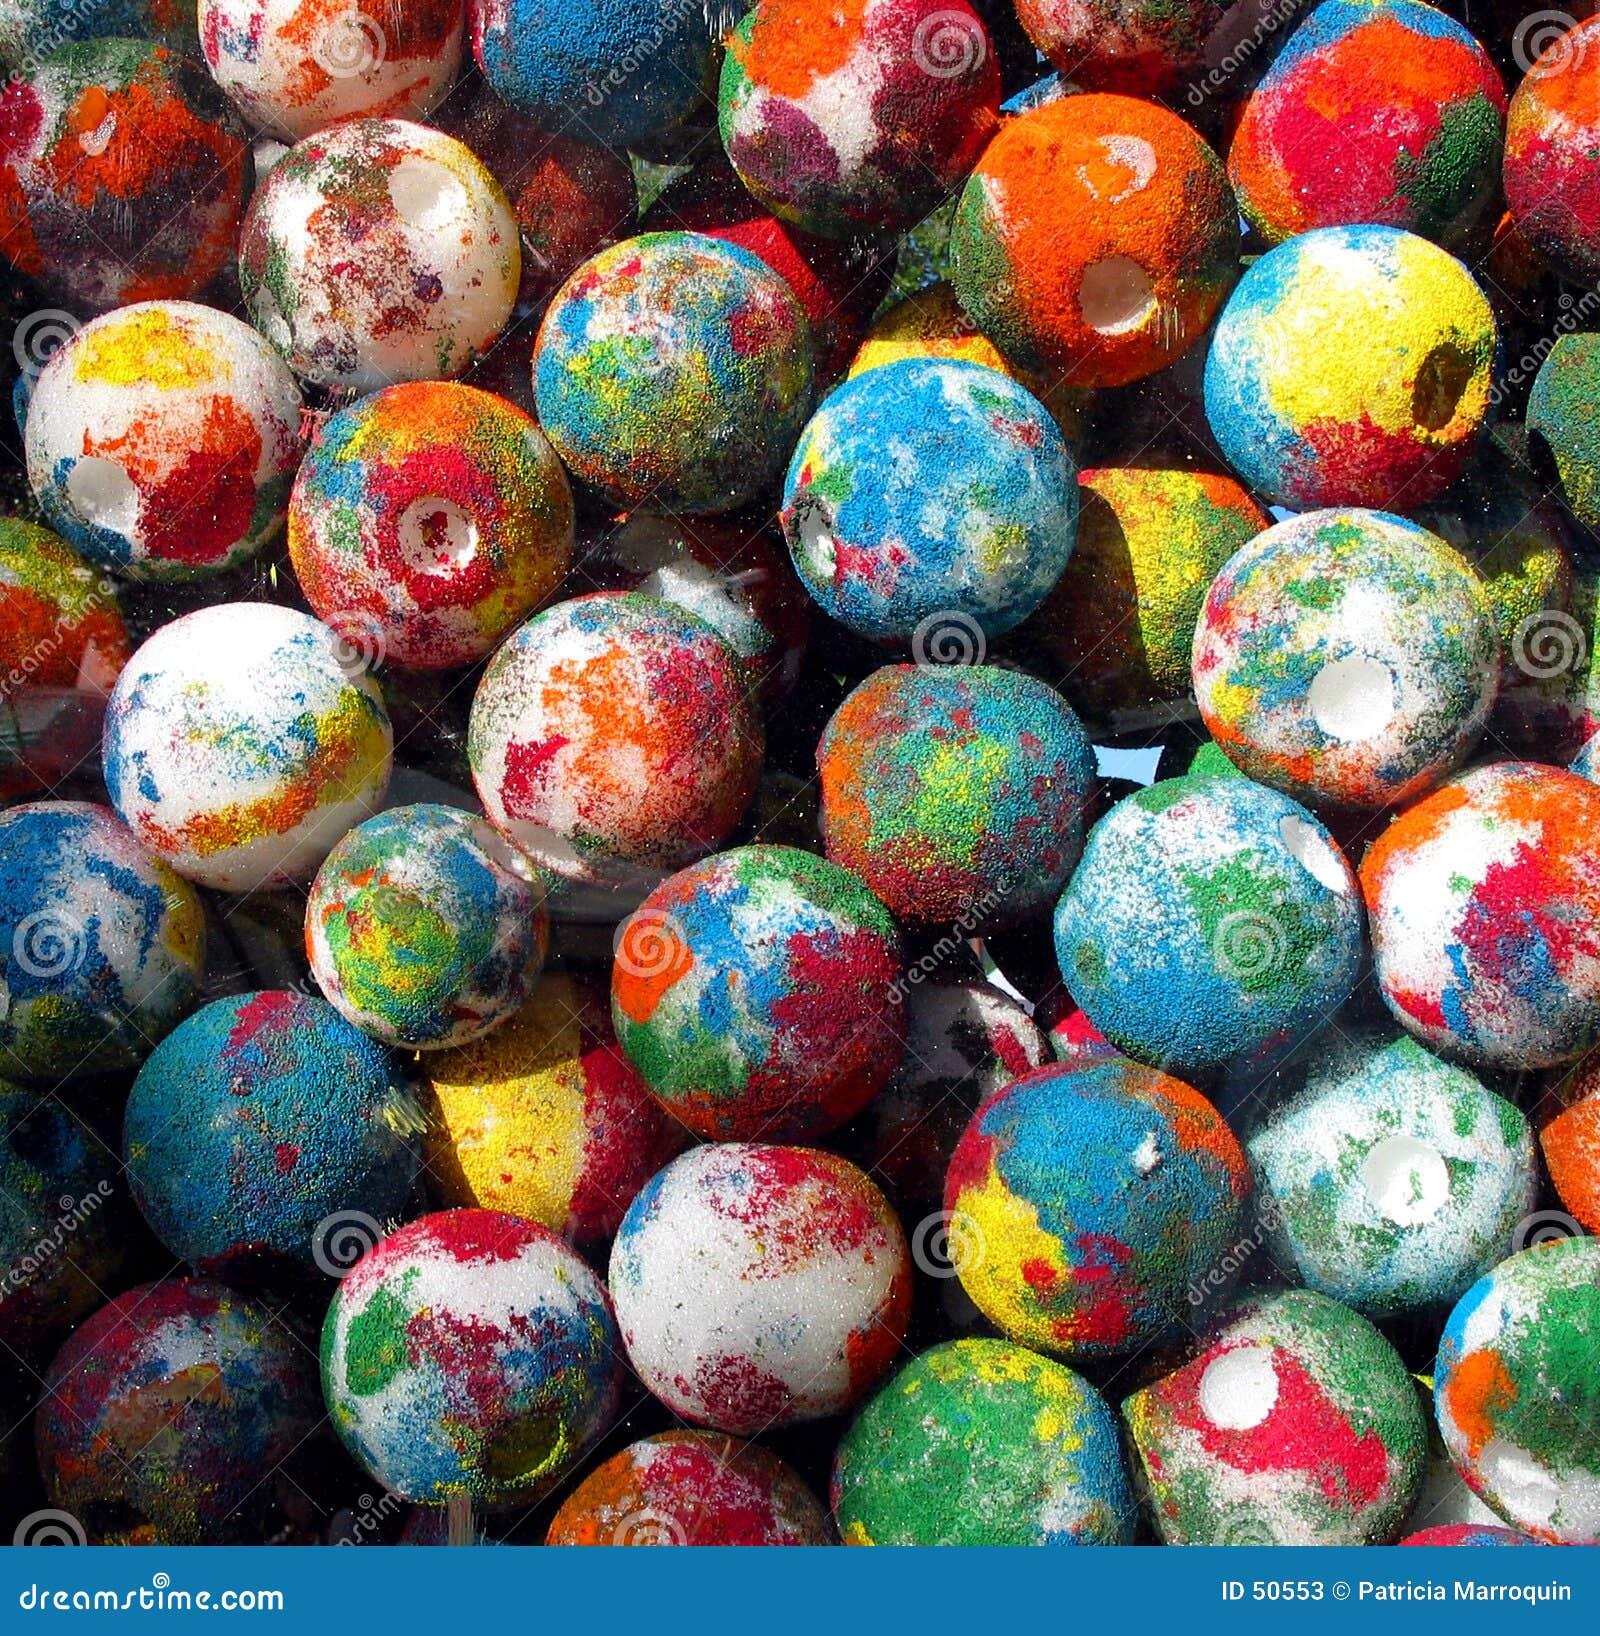 Download σφαίρες που χρωματίζονται στοκ εικόνα. εικόνα από styrofoam - 50553